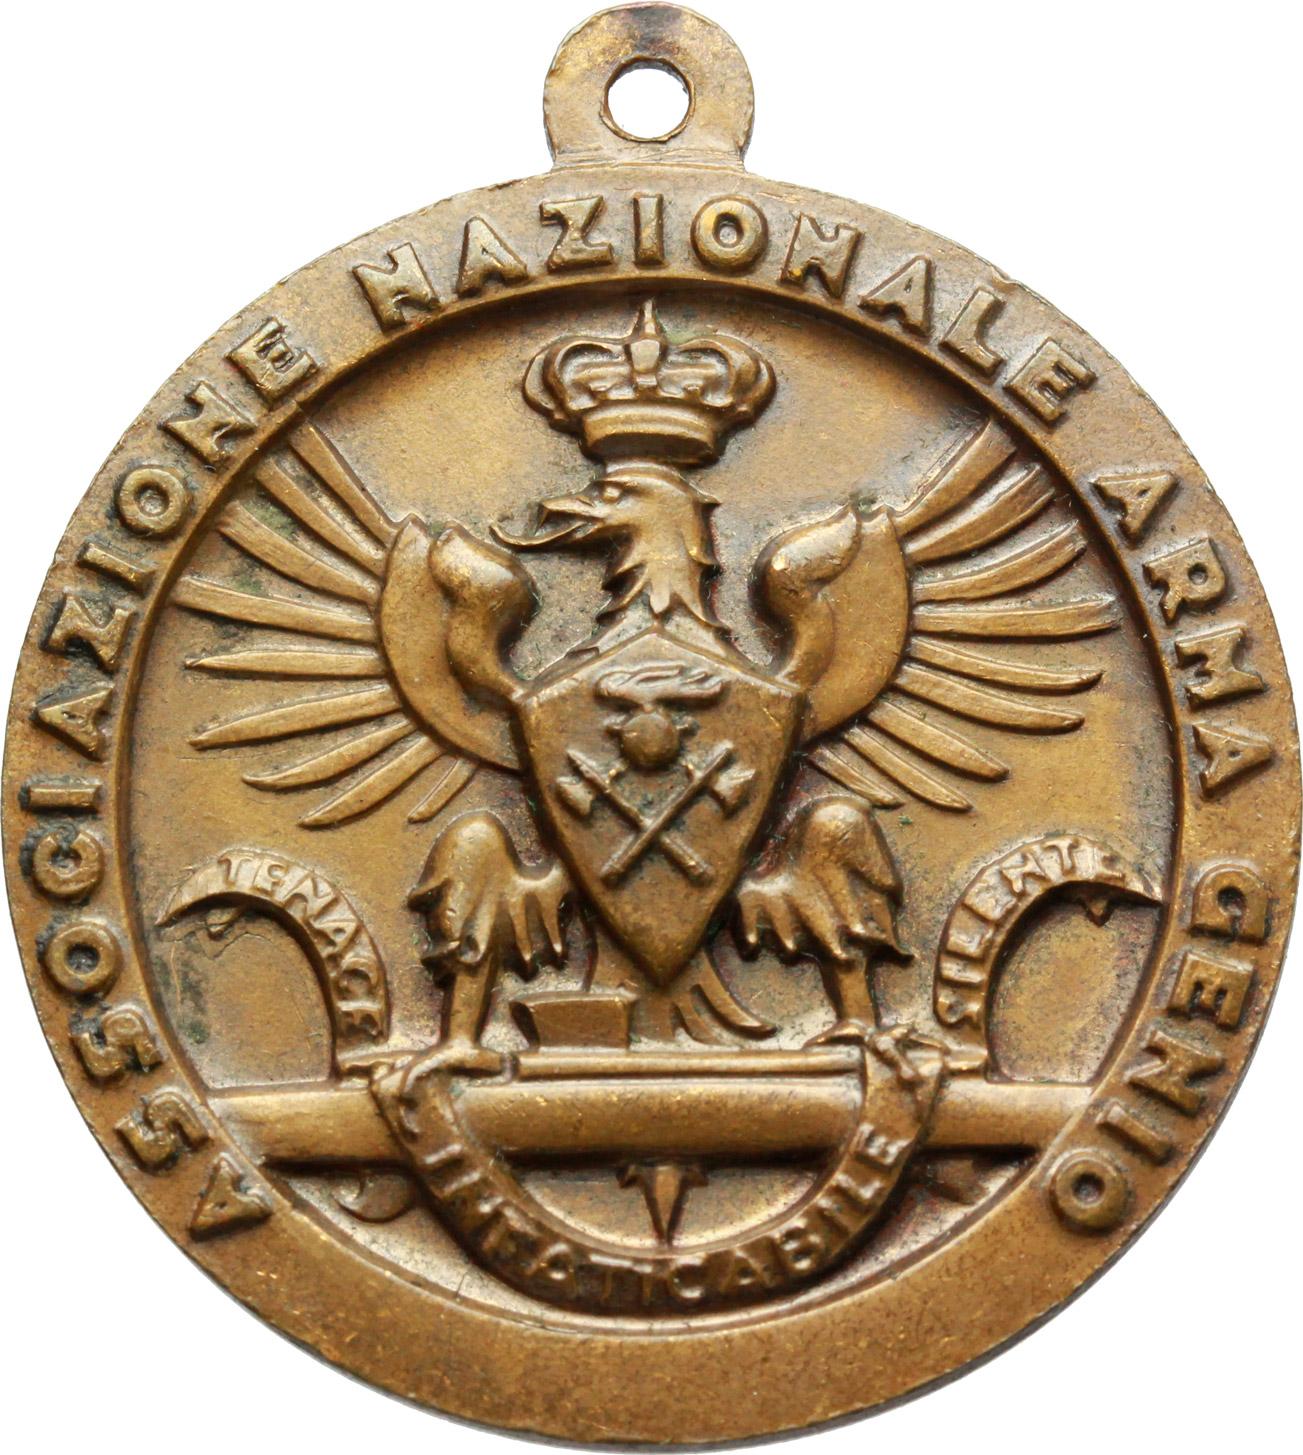 R/  Medaglia Associazione Nazionale Arma Genio. IV adunata dei genieri d'Italia, Firenze, 23-25 5 XIV.     AE.   mm. 35.50    SPL.